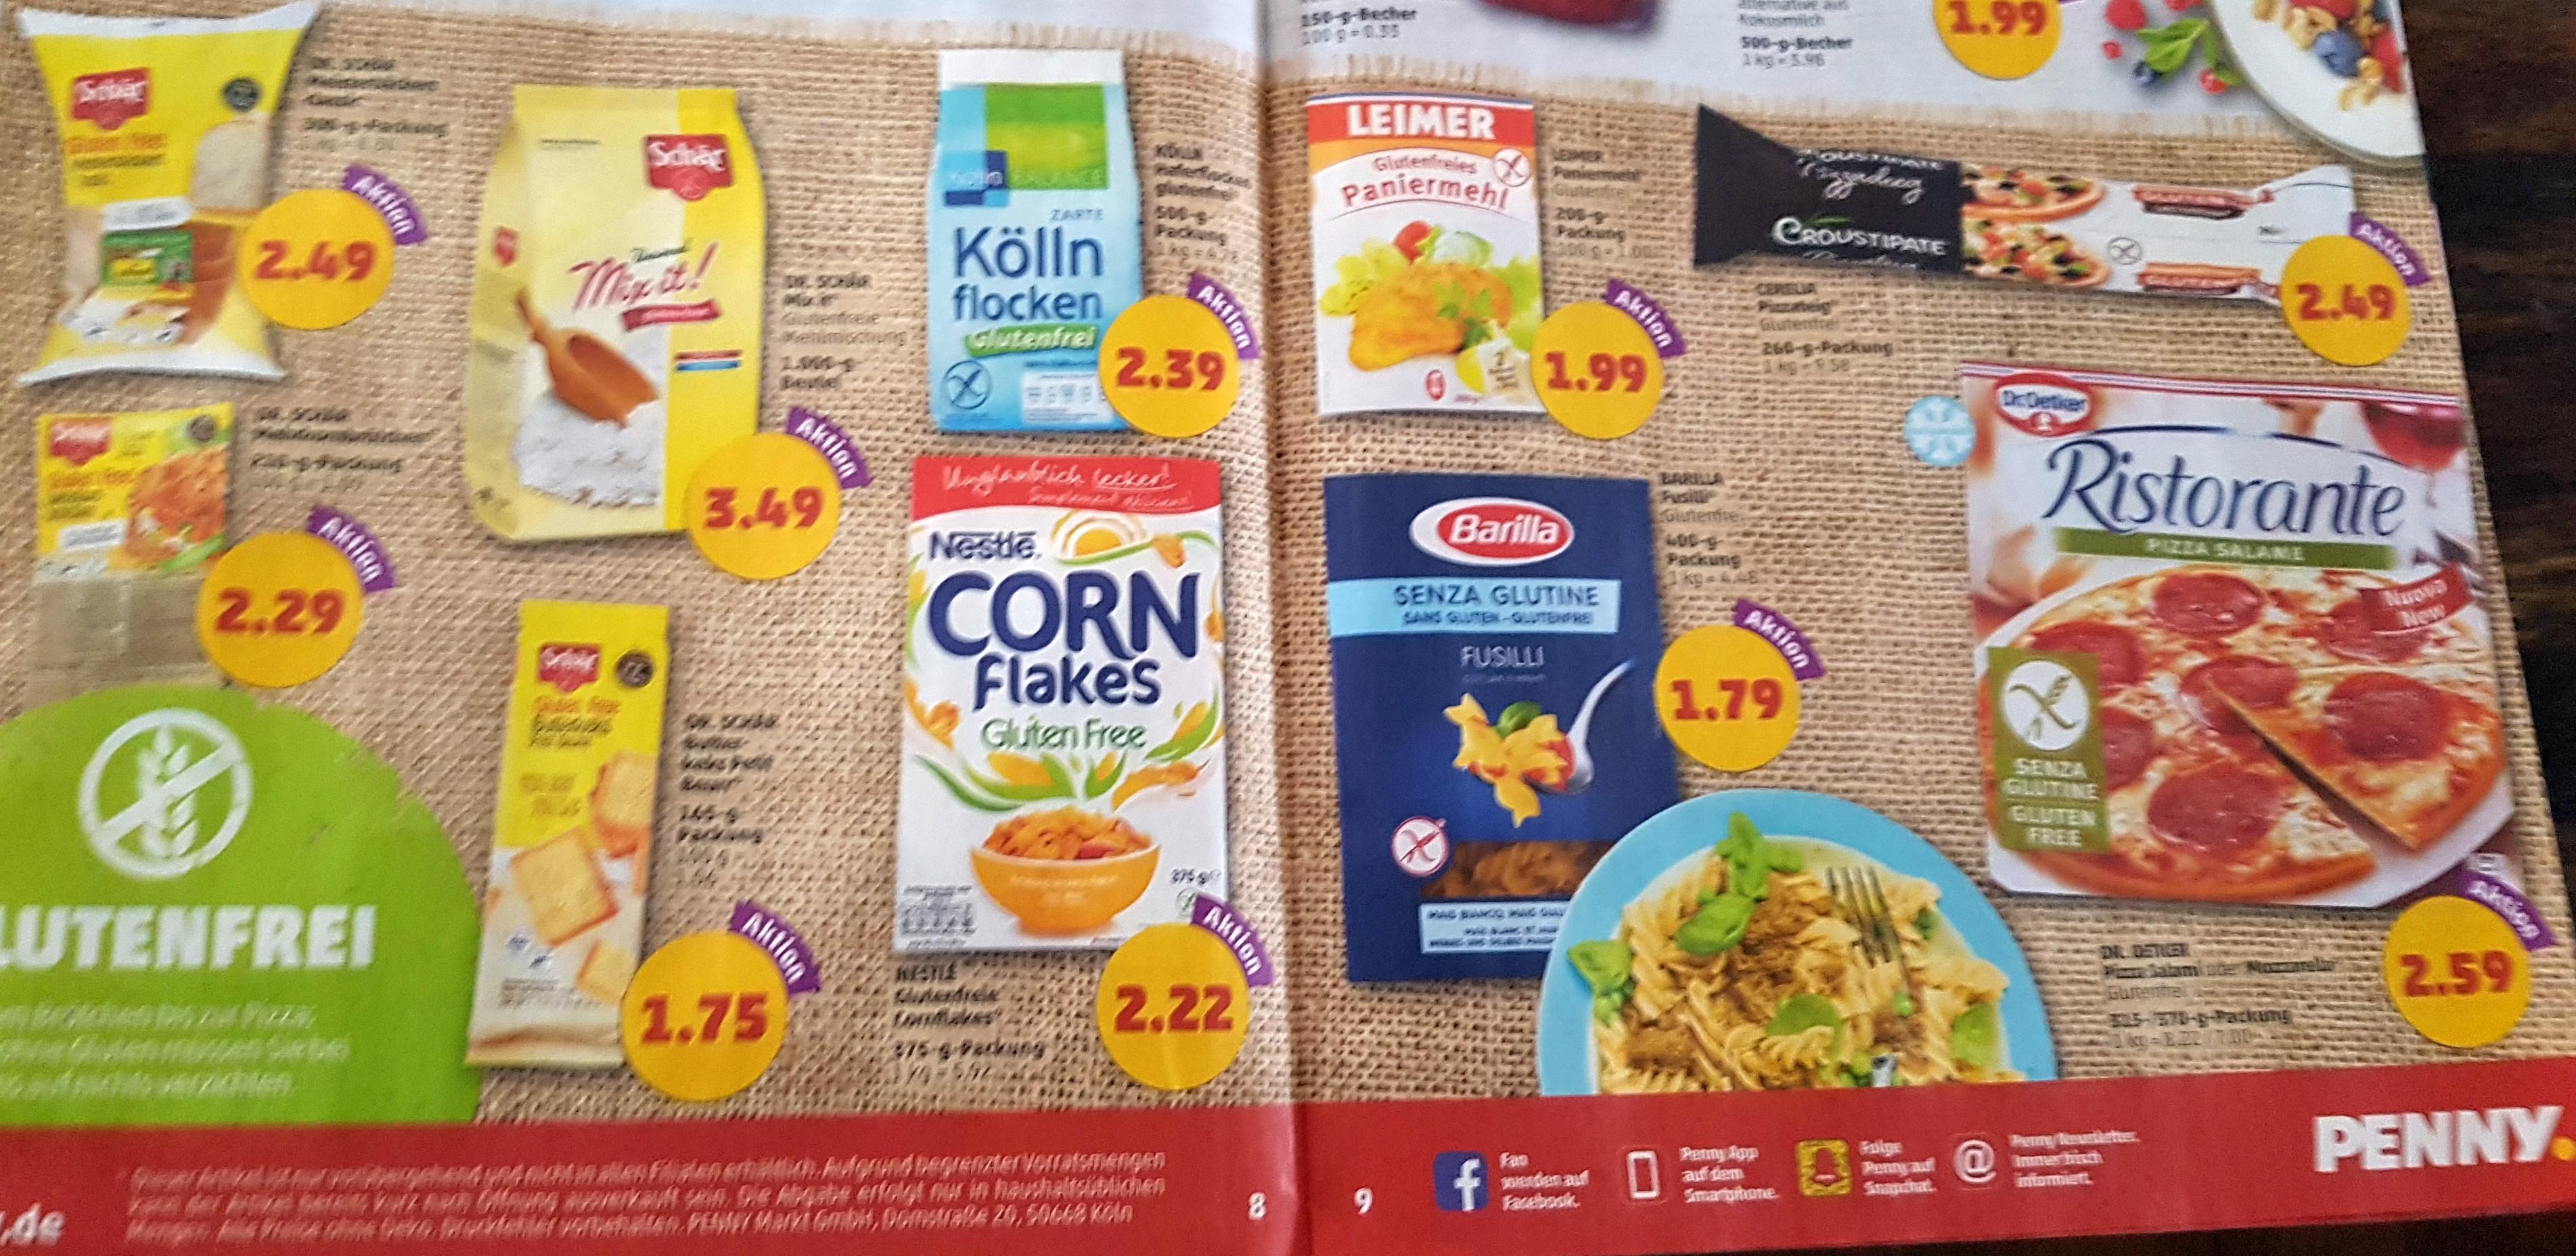 Penny – glutenfreie Produkte im Angebot